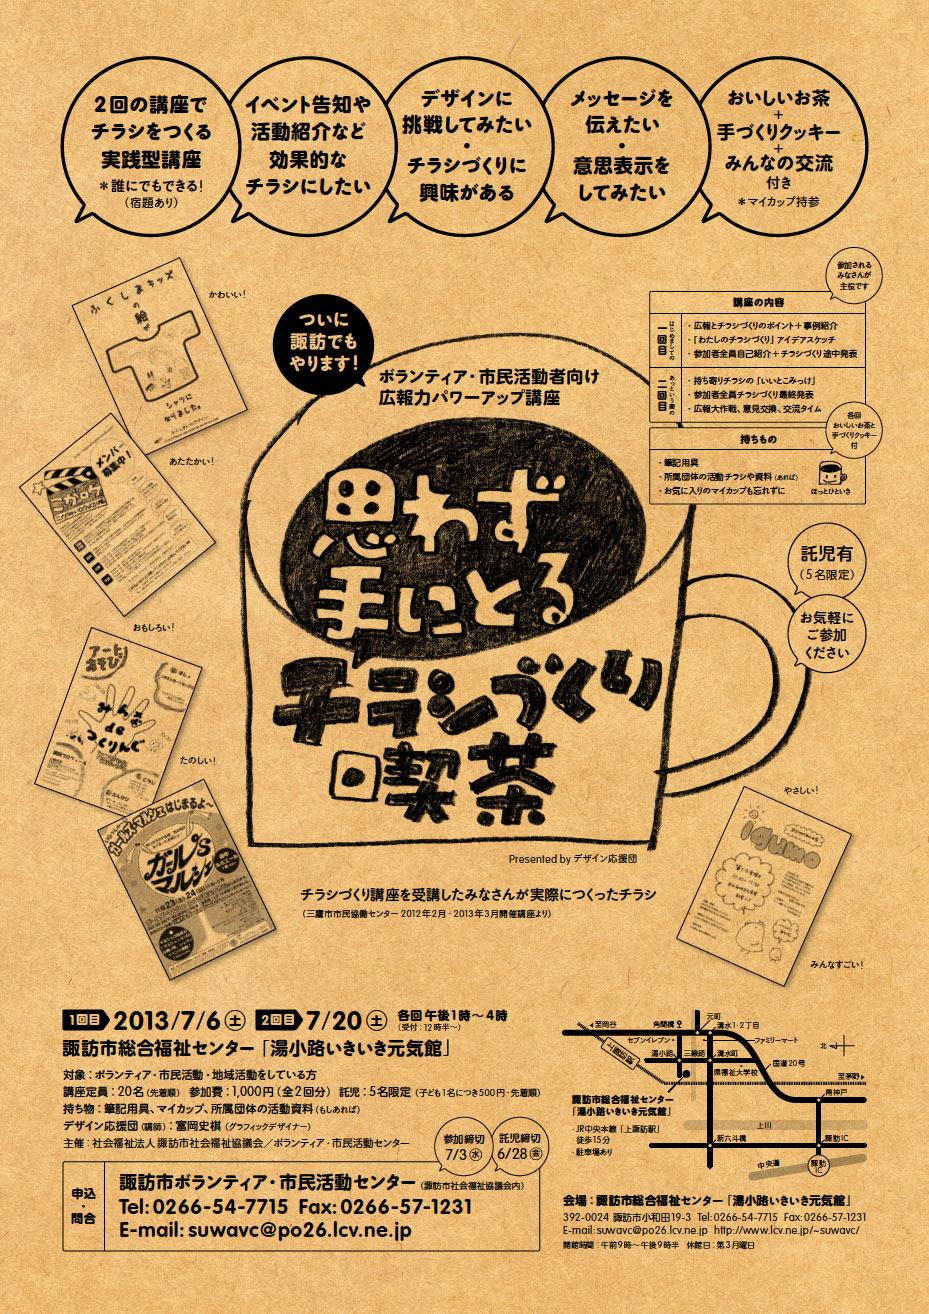 flier_kissa_suwa_2013_poster.jpg